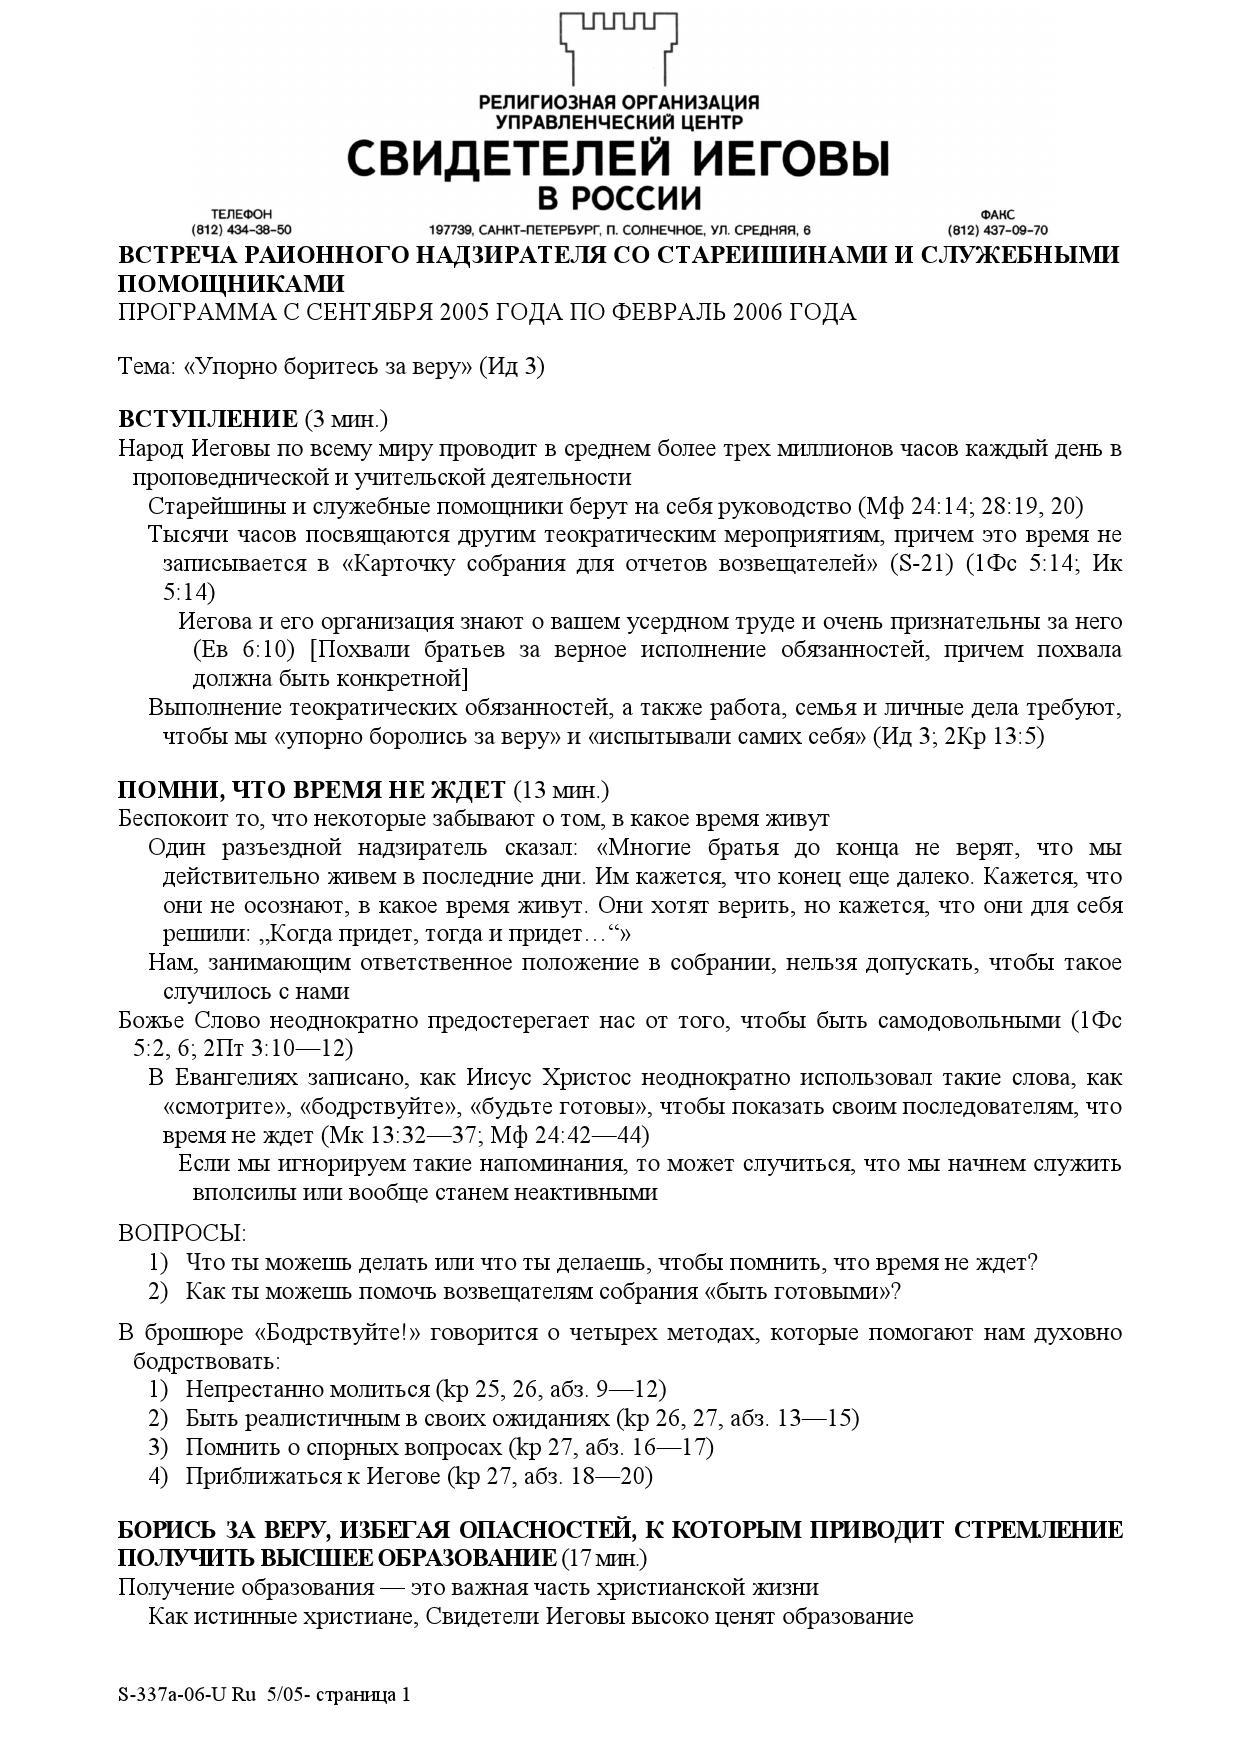 S-337-U-5-05 (конец, ВО, независ.мышл)_000001